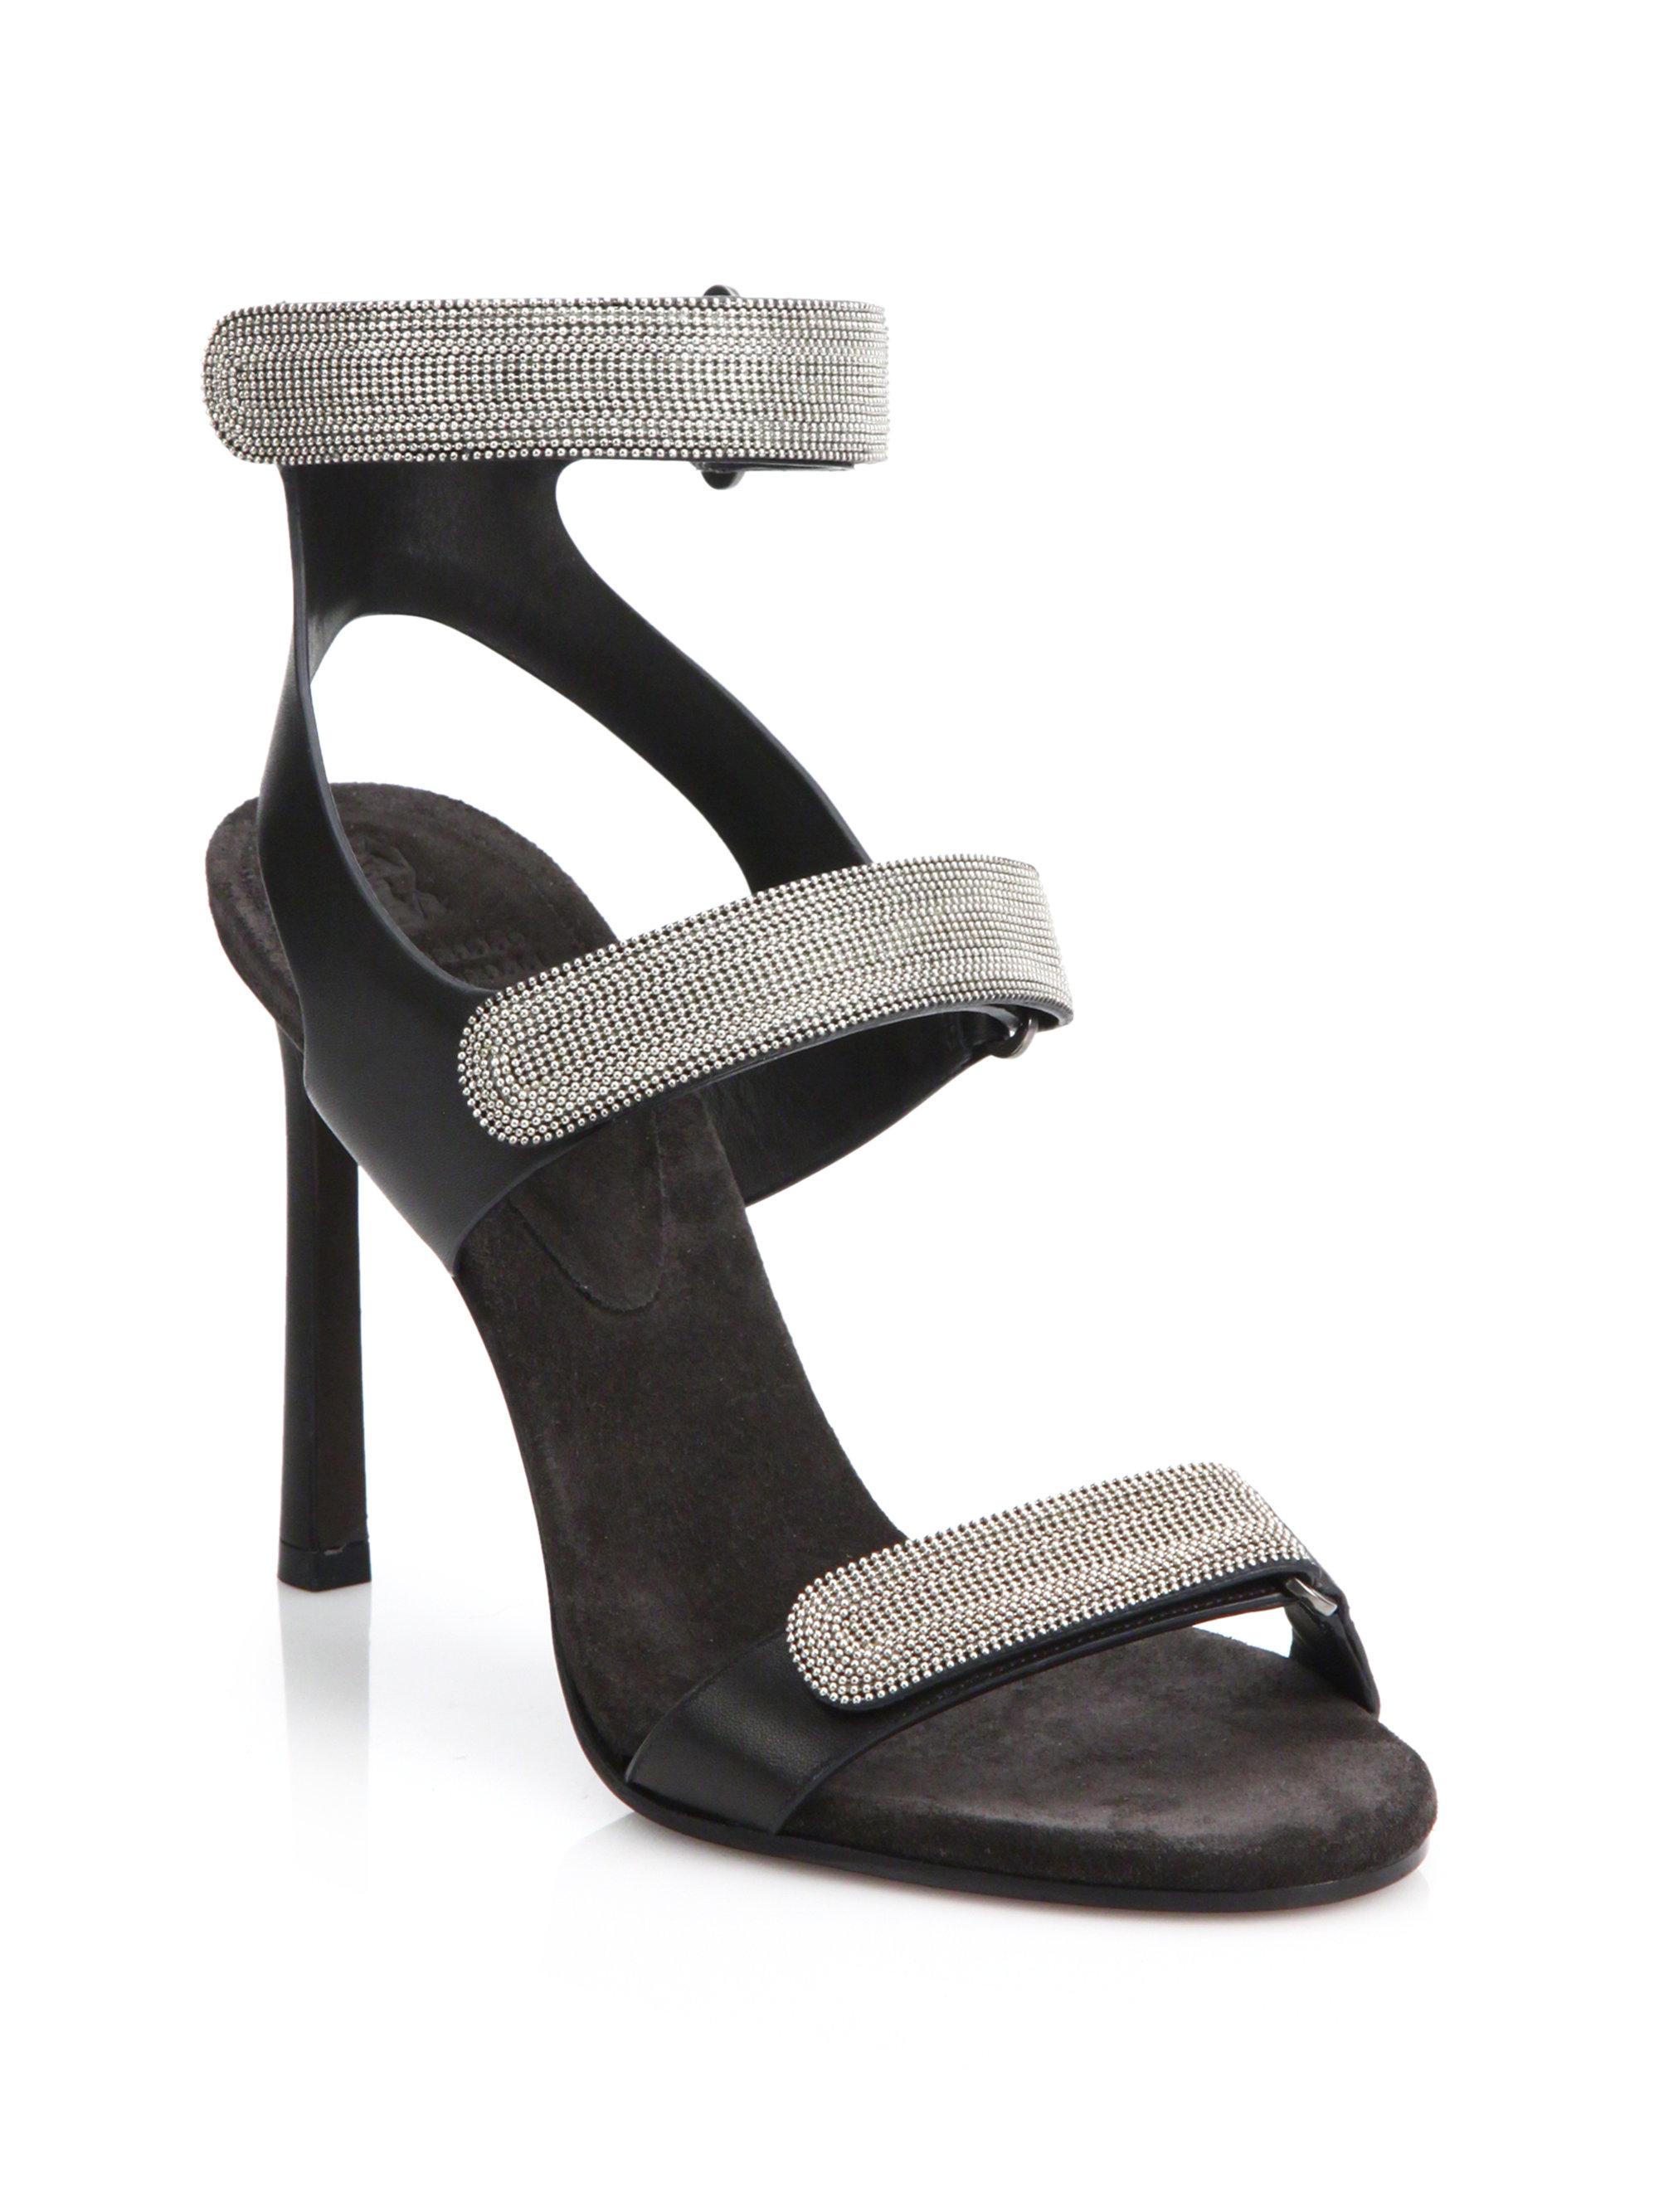 cheap new Brunello Cucinelli Monili-Trimmed Ankle Strap Sandals reliable cheap online JgoQl